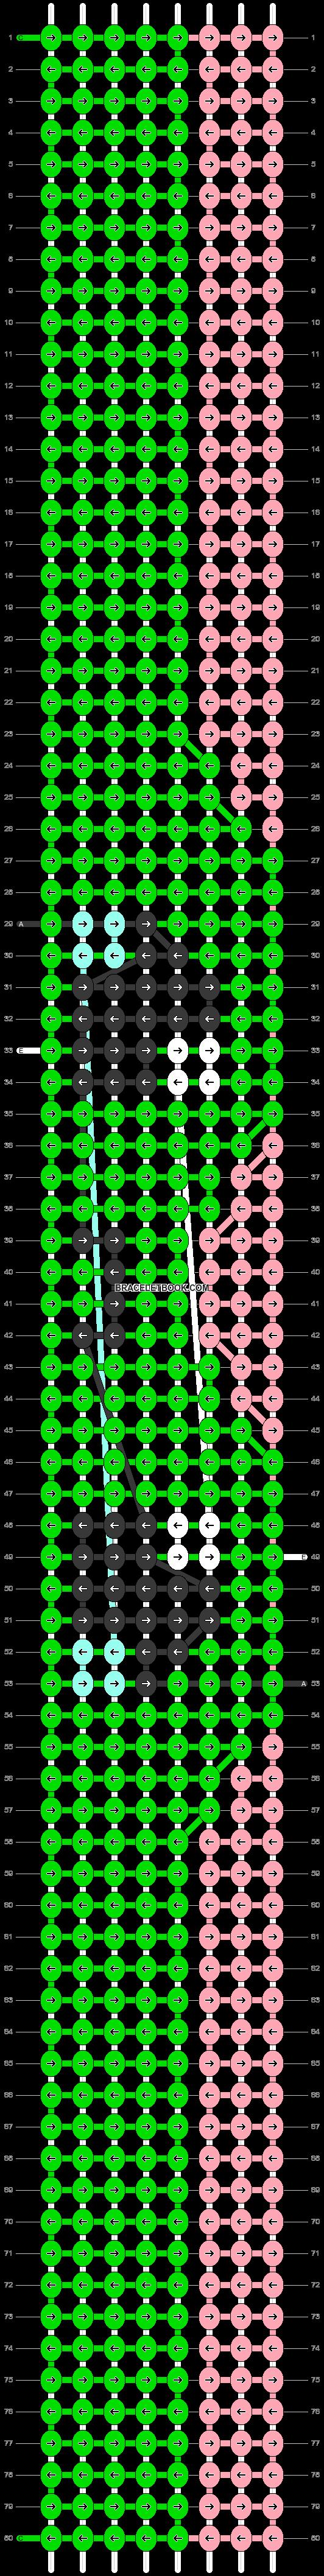 Alpha pattern #97347 pattern